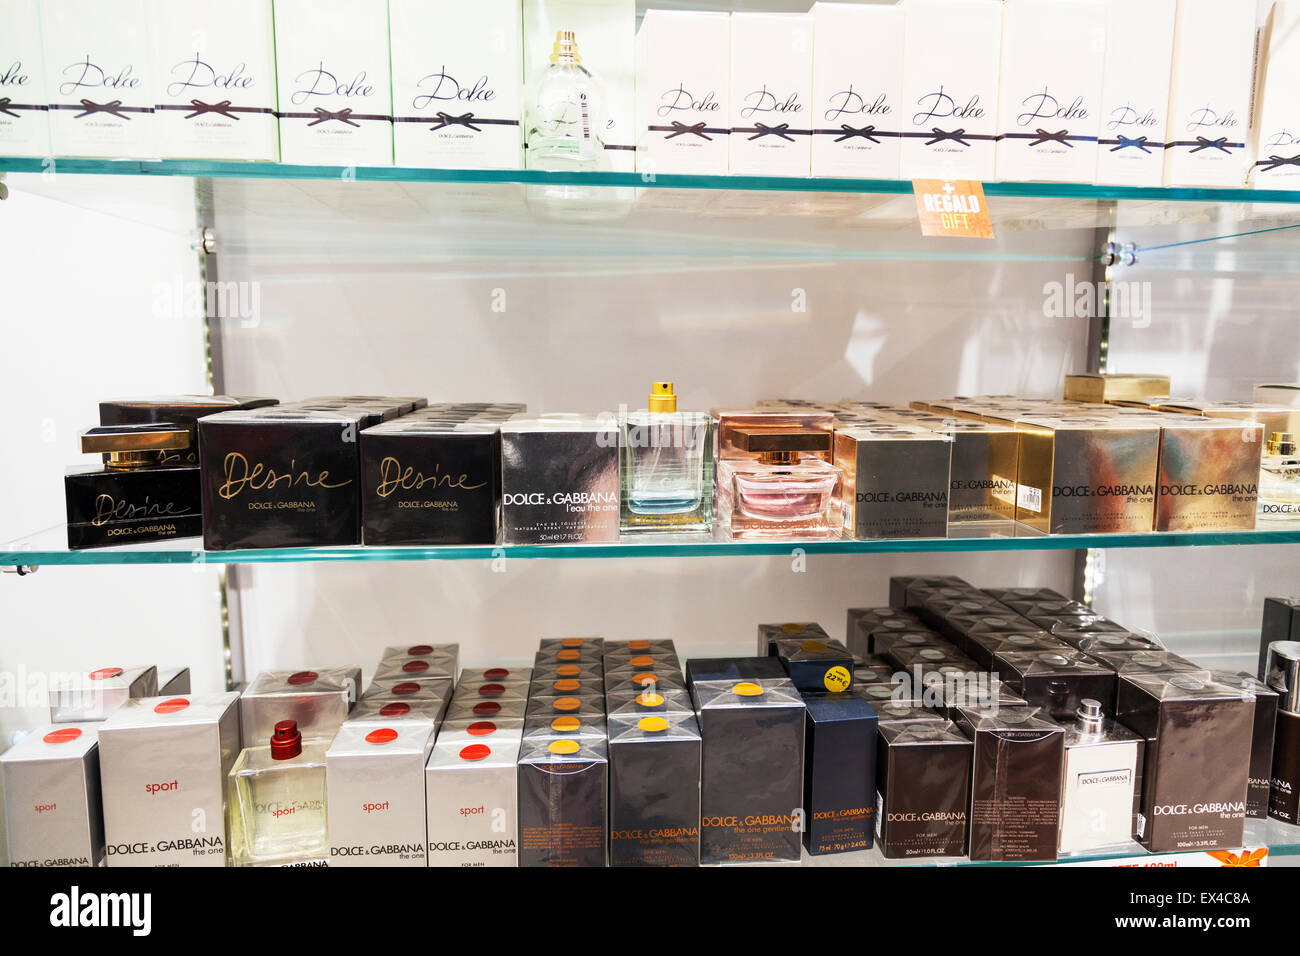 Dolce and Gabbana fragrances perfumes perfume display ladies Eau De Toilette aftershave for men shop store - Stock Image